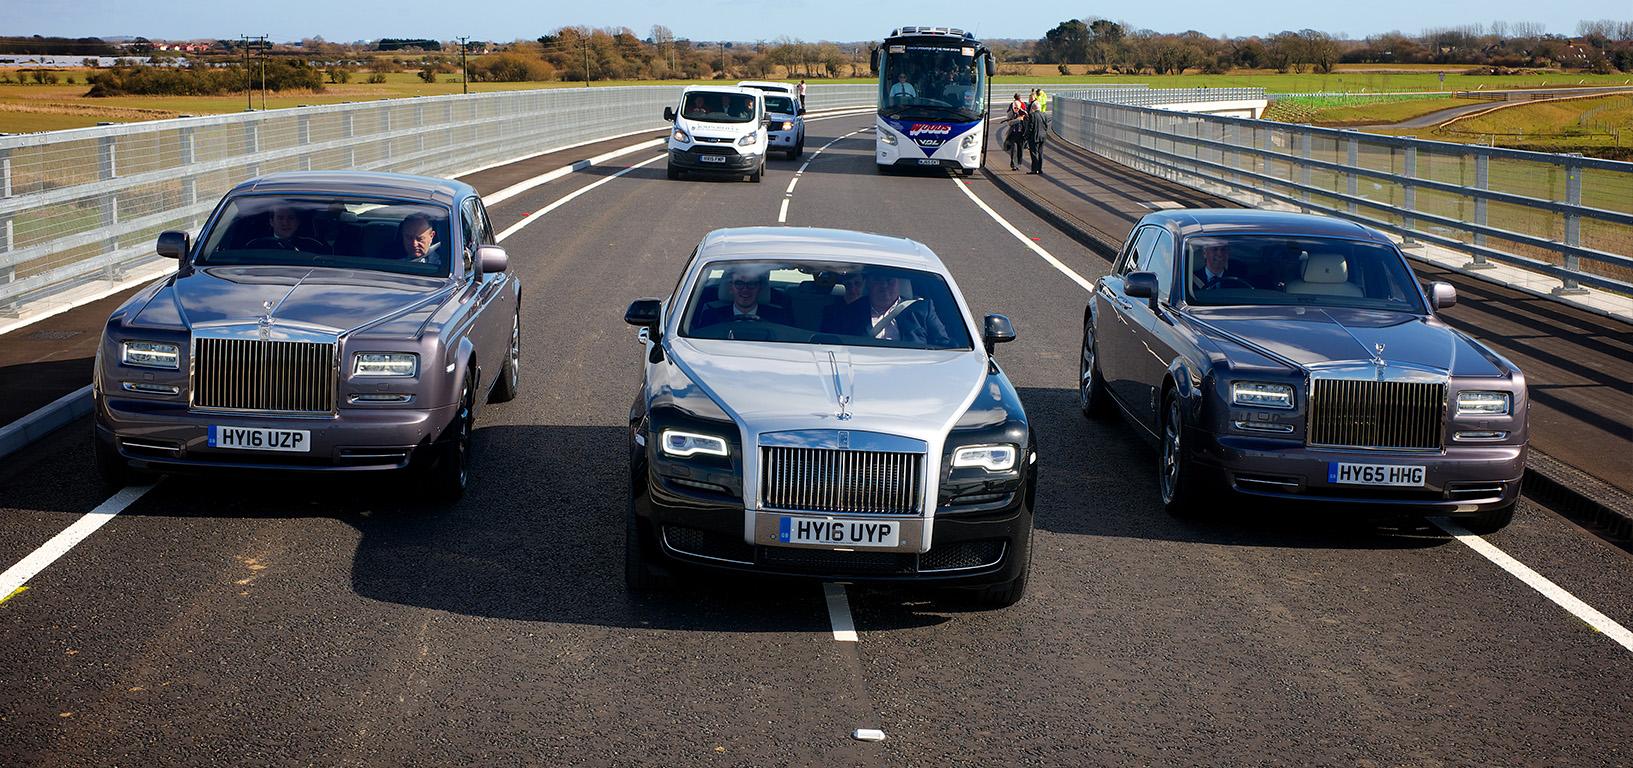 Rolls Royce Limited Edition Phantom VII Zenith